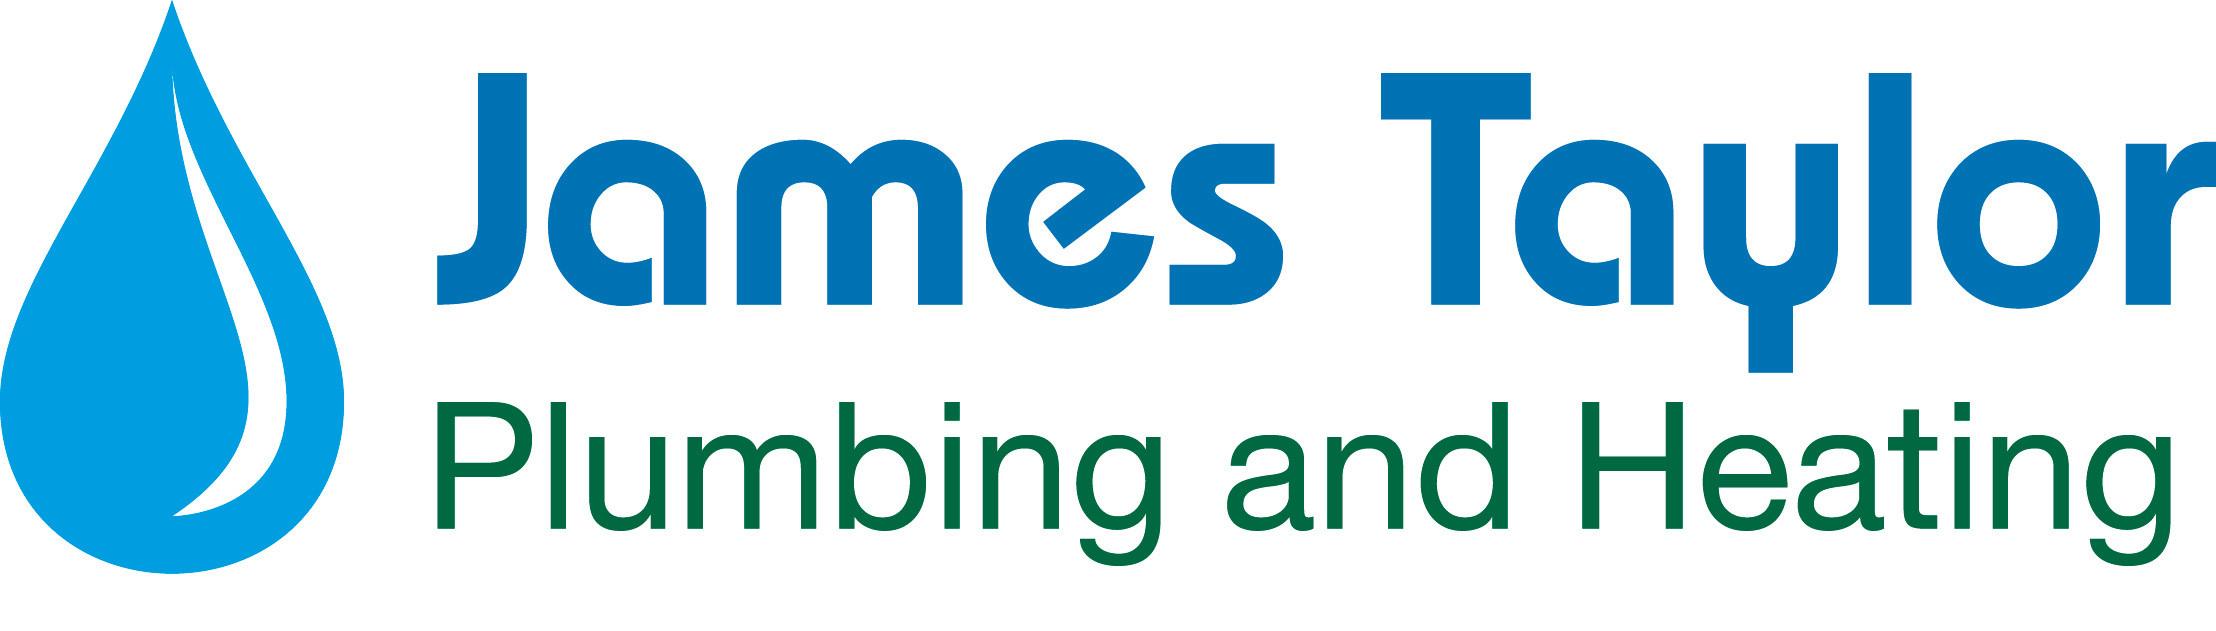 James Taylor Plumbing and Heating logo.j